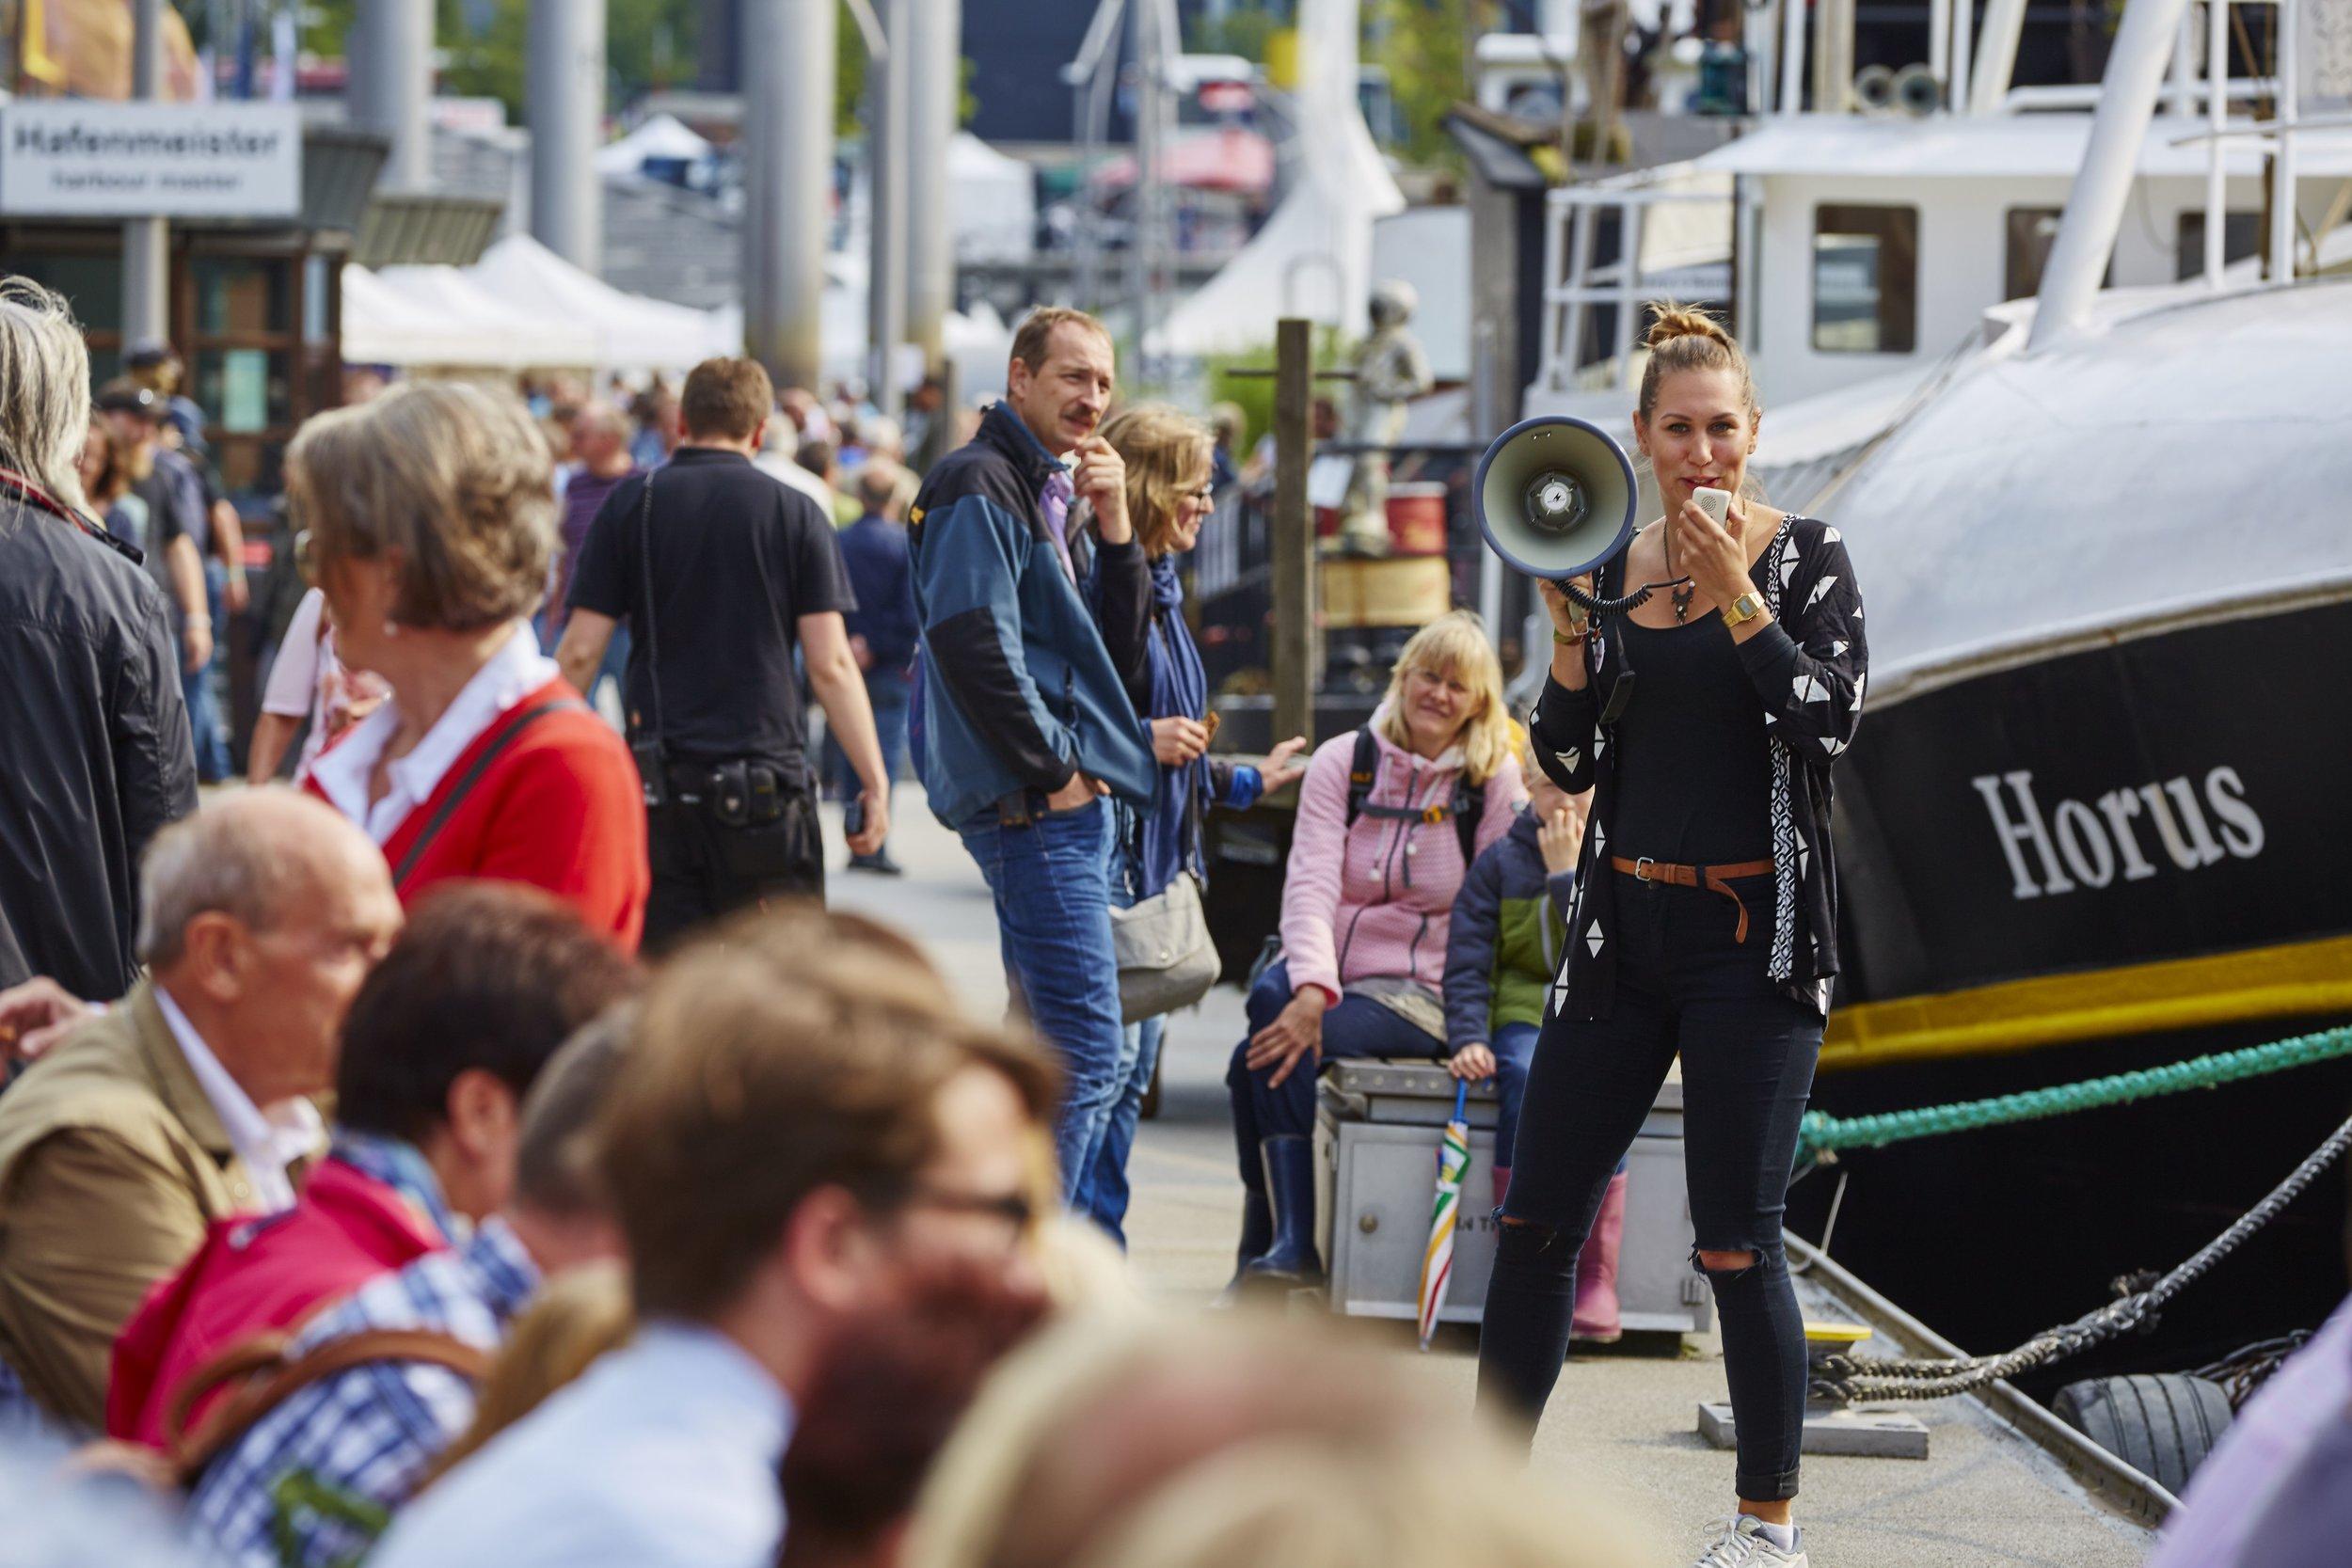 Hingehört beim Elbfest 2016_low Foto www.malzkornfoto.de.jpg